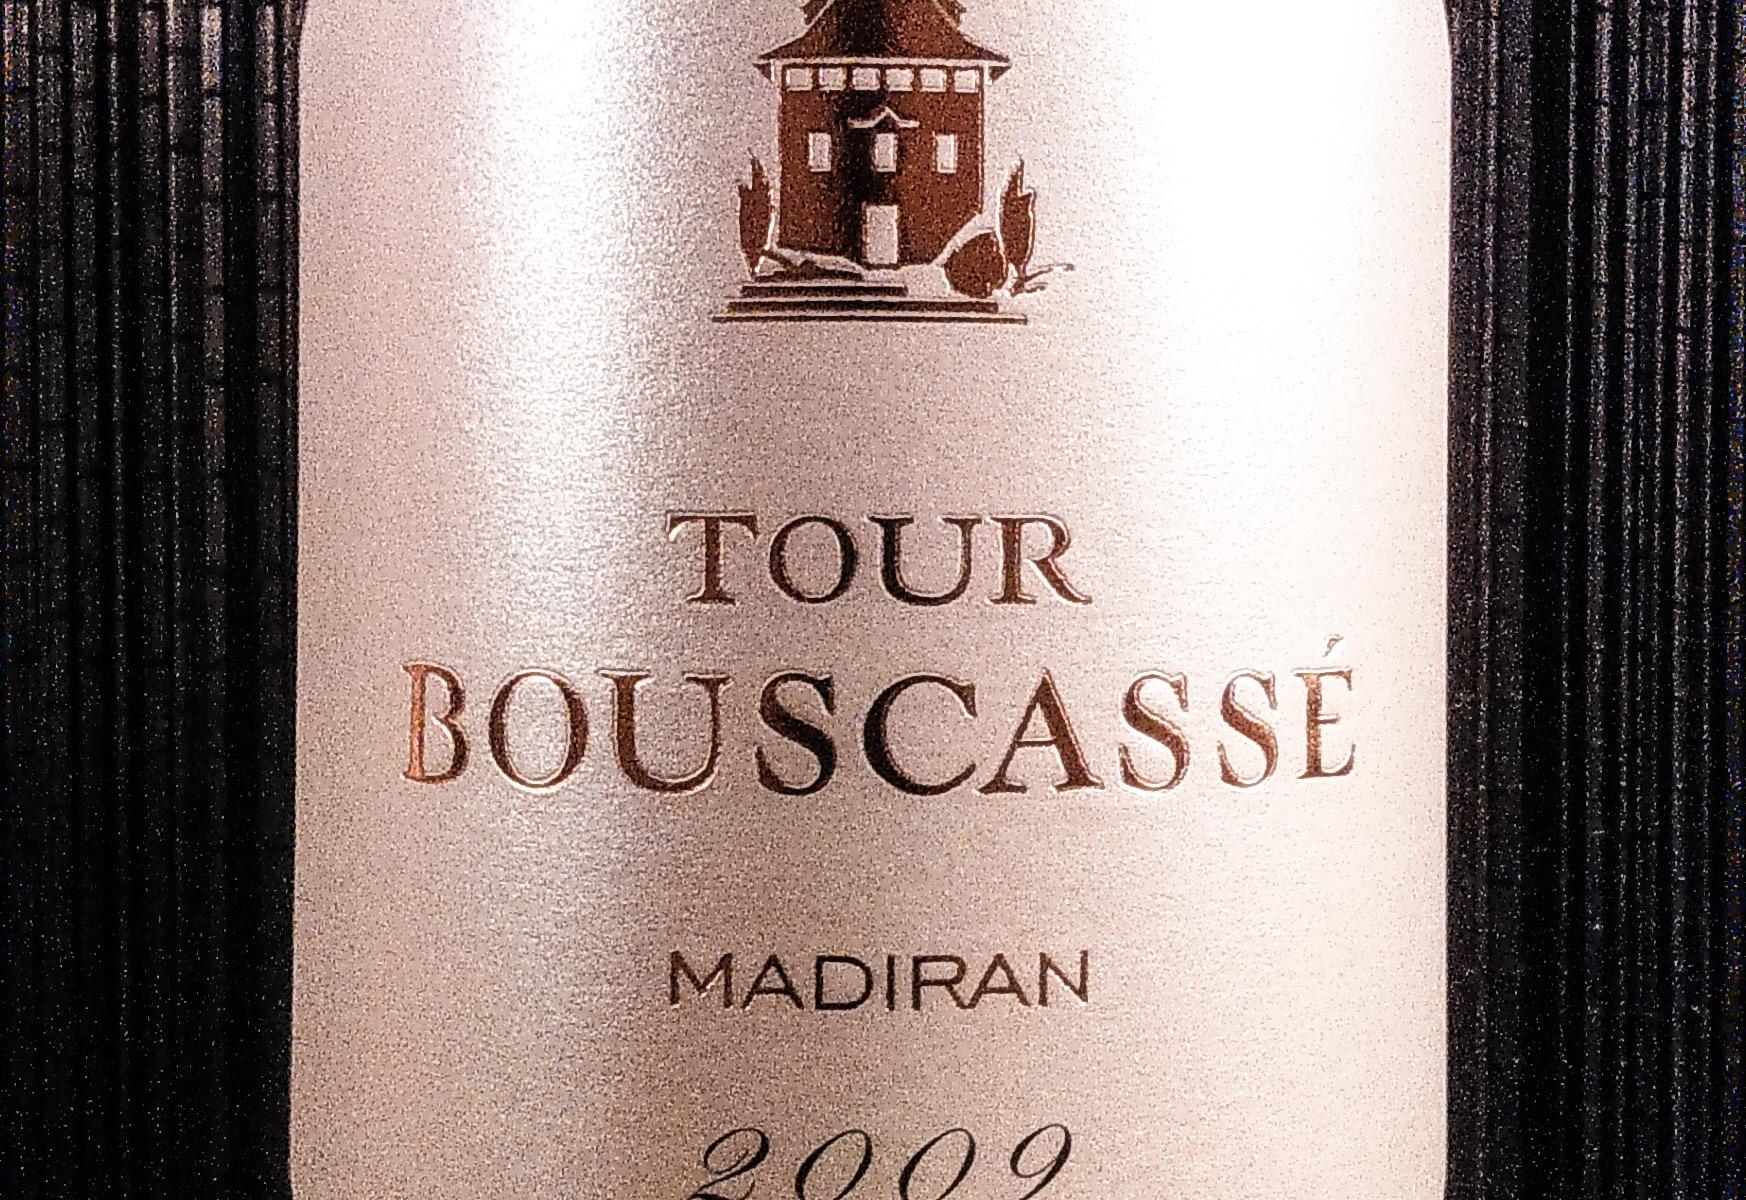 tour_bouscasse_madiran